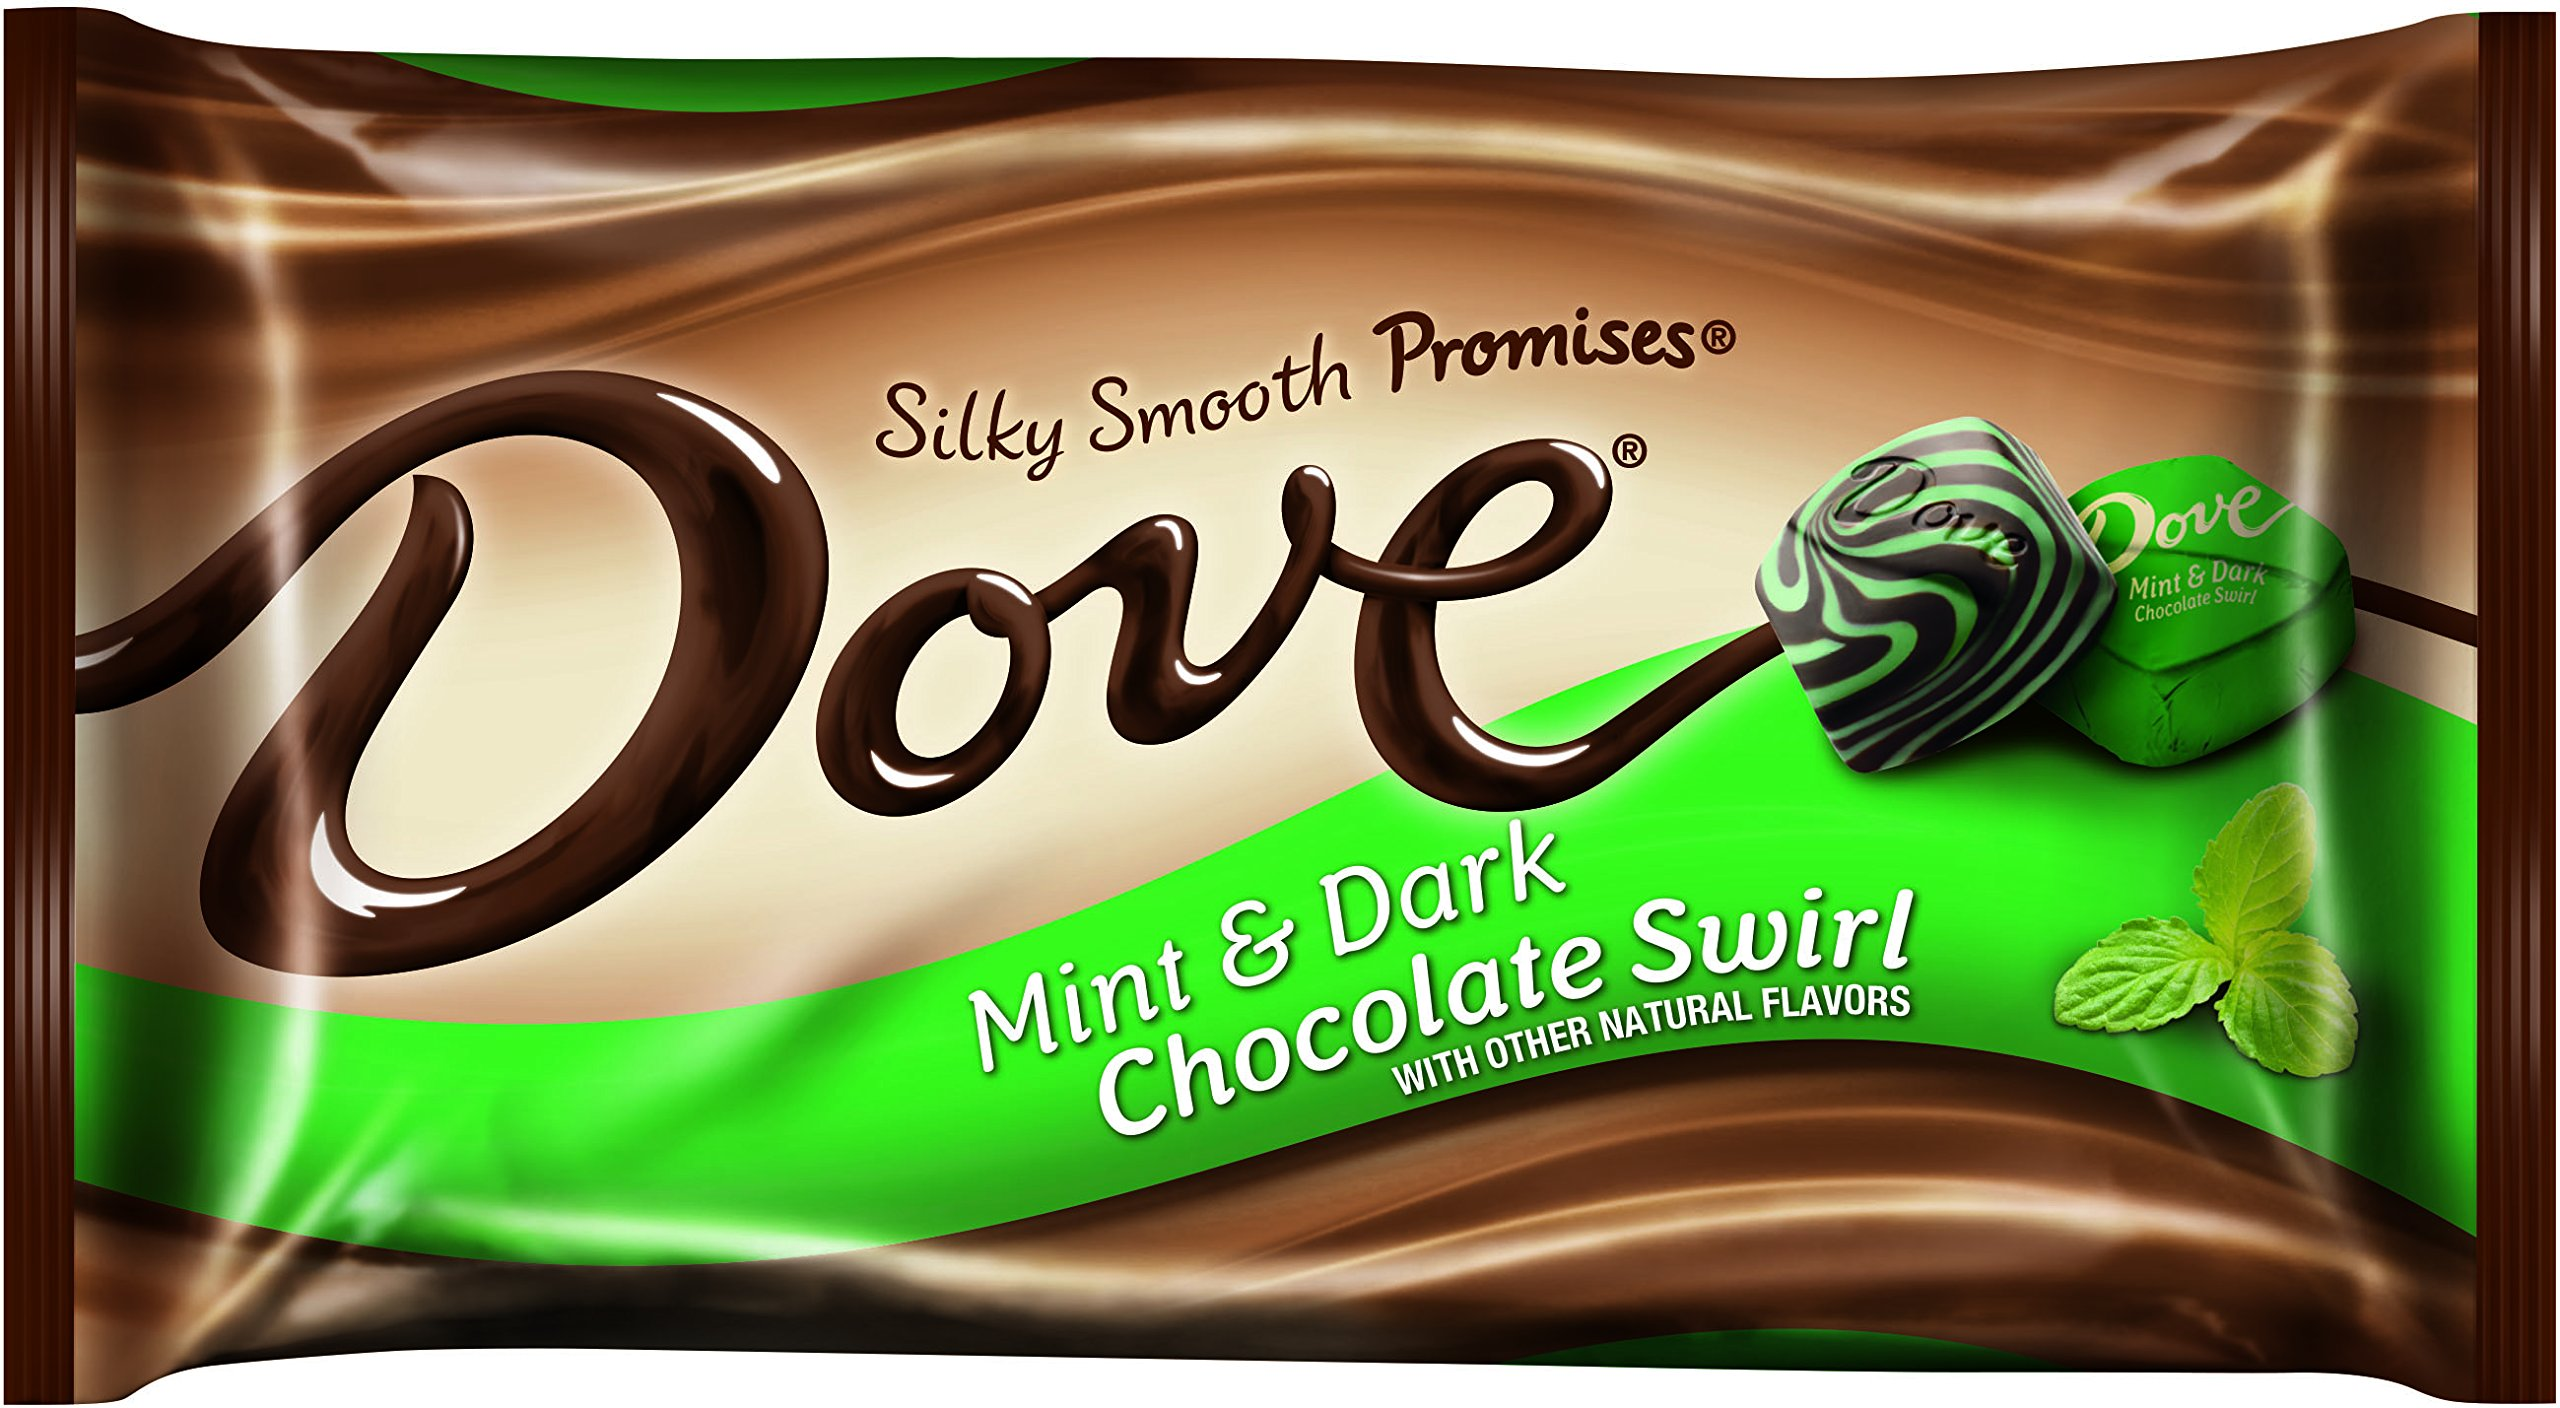 Amazon.com : Dove Sea Salt and Caramel Promises, 8.5 Ounce